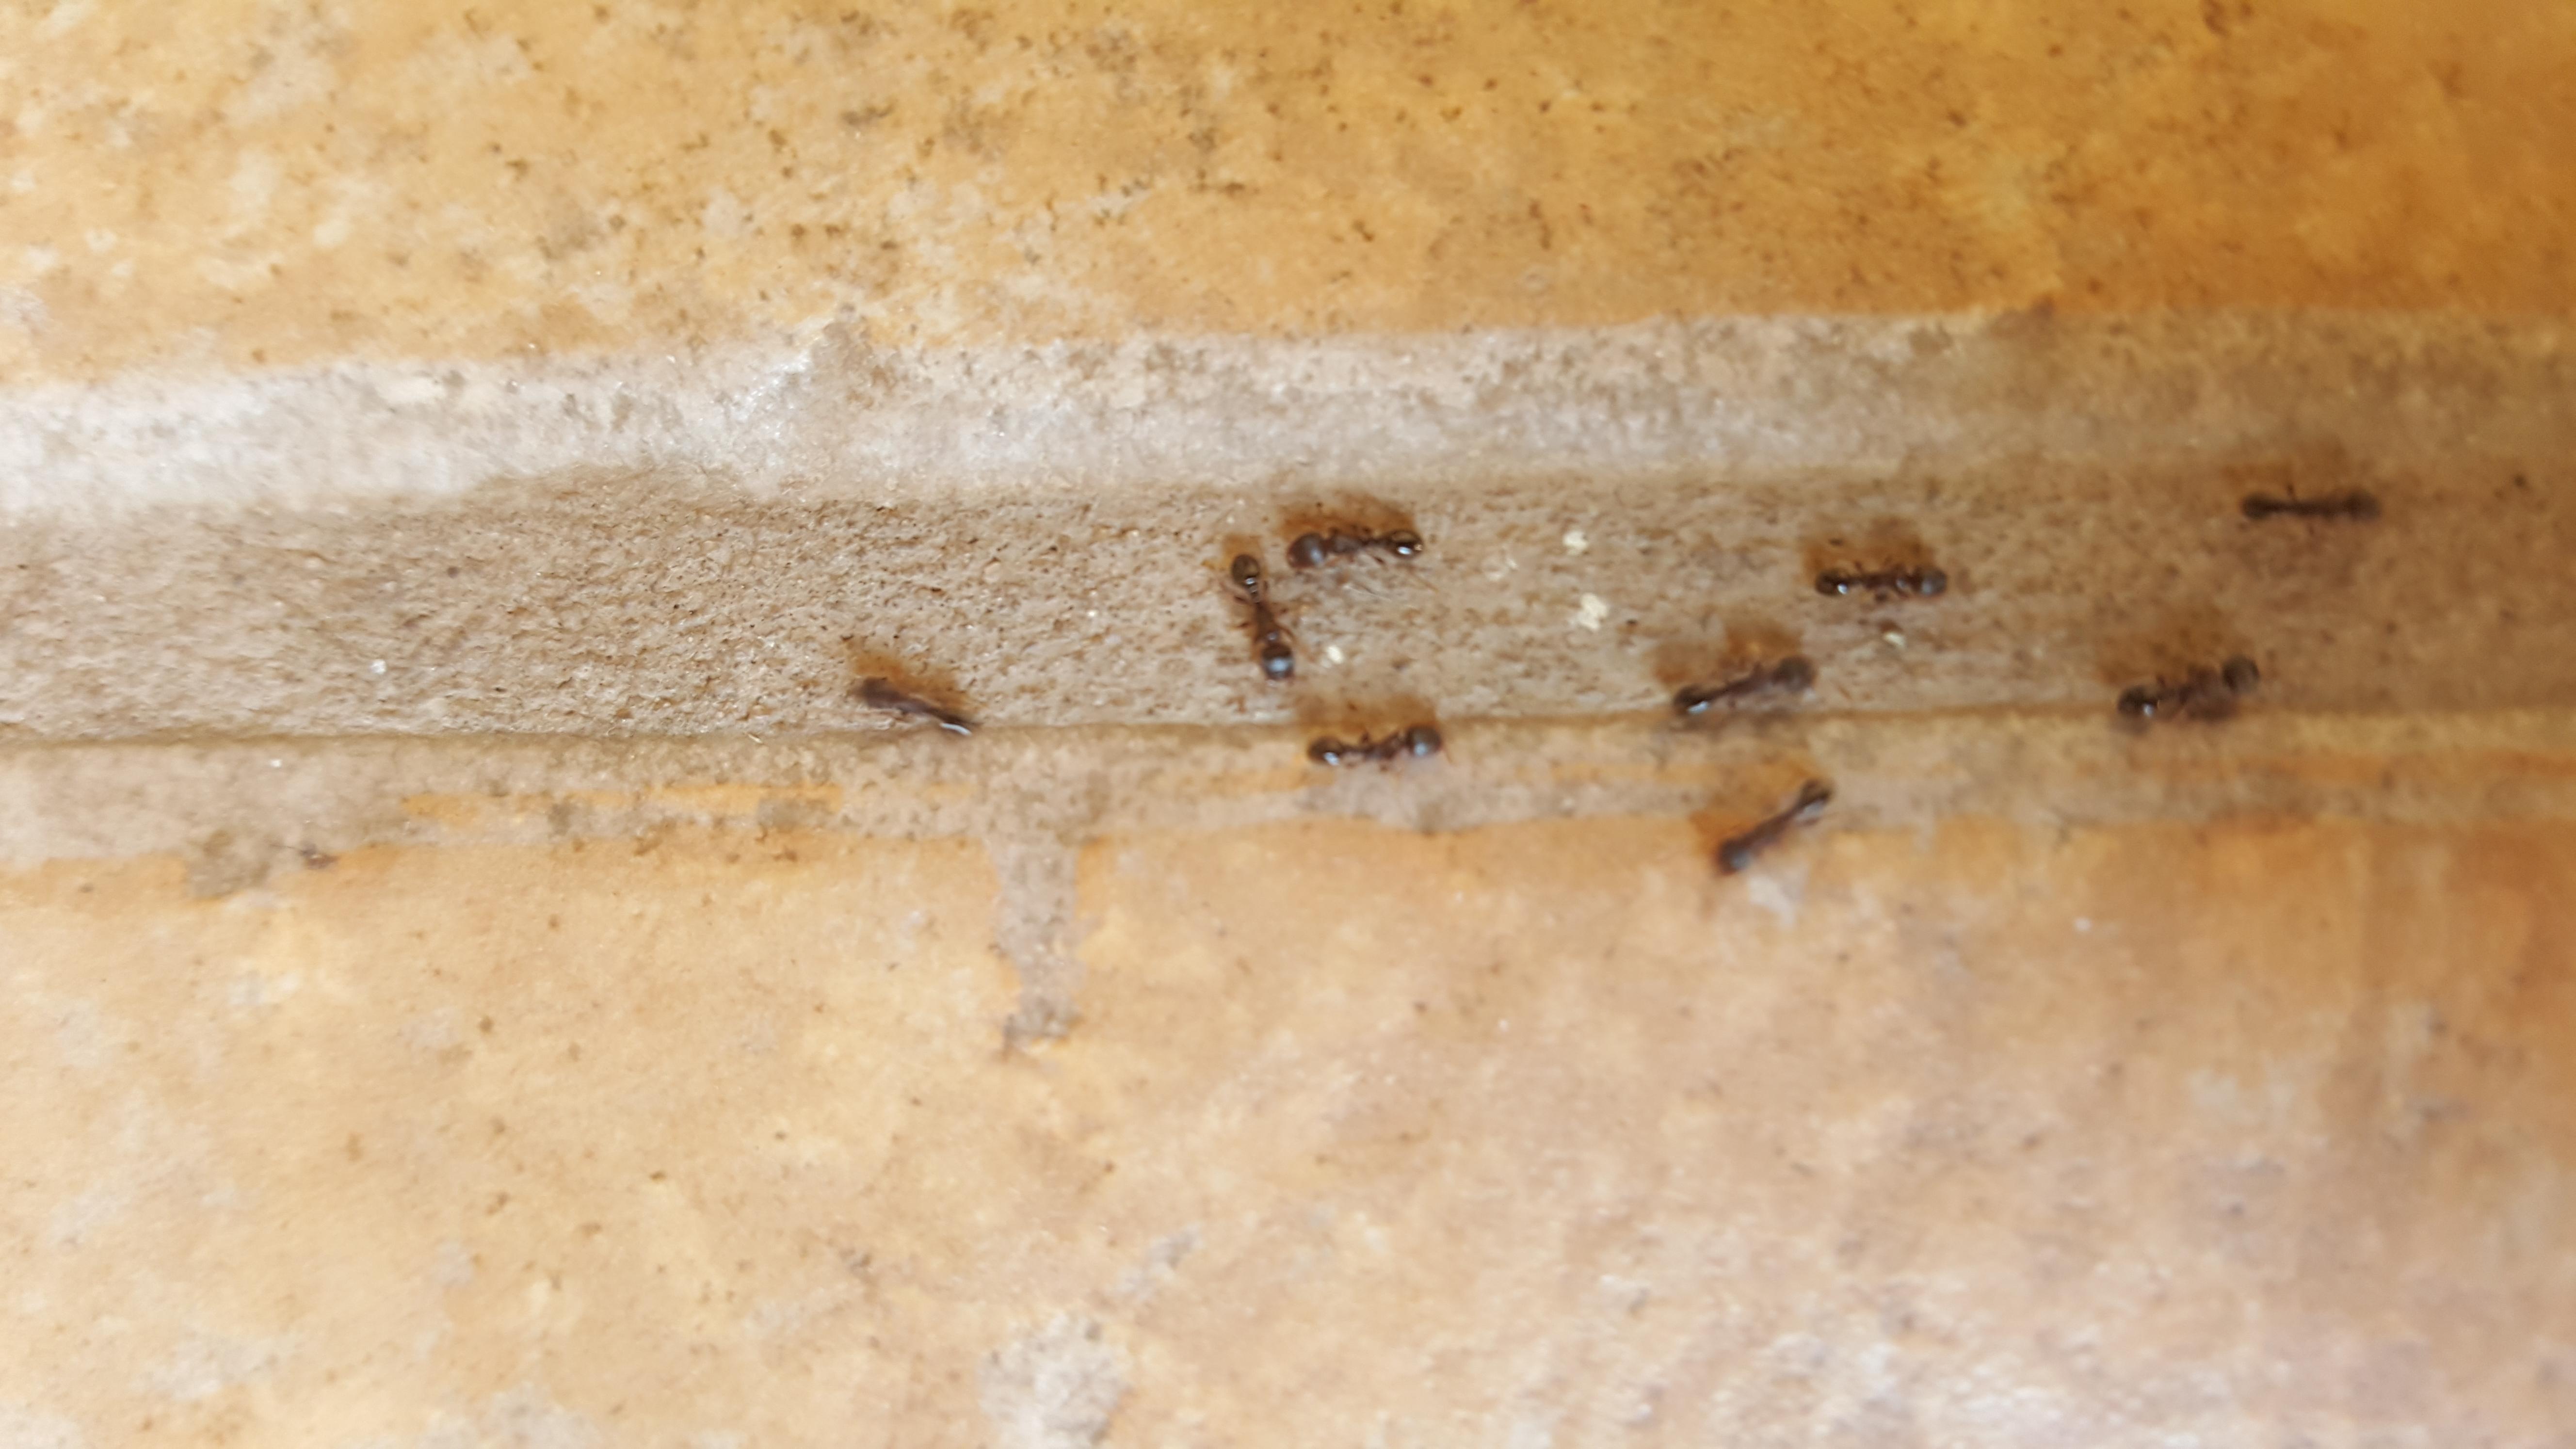 eastside pest control - exterminators local qualified experienced